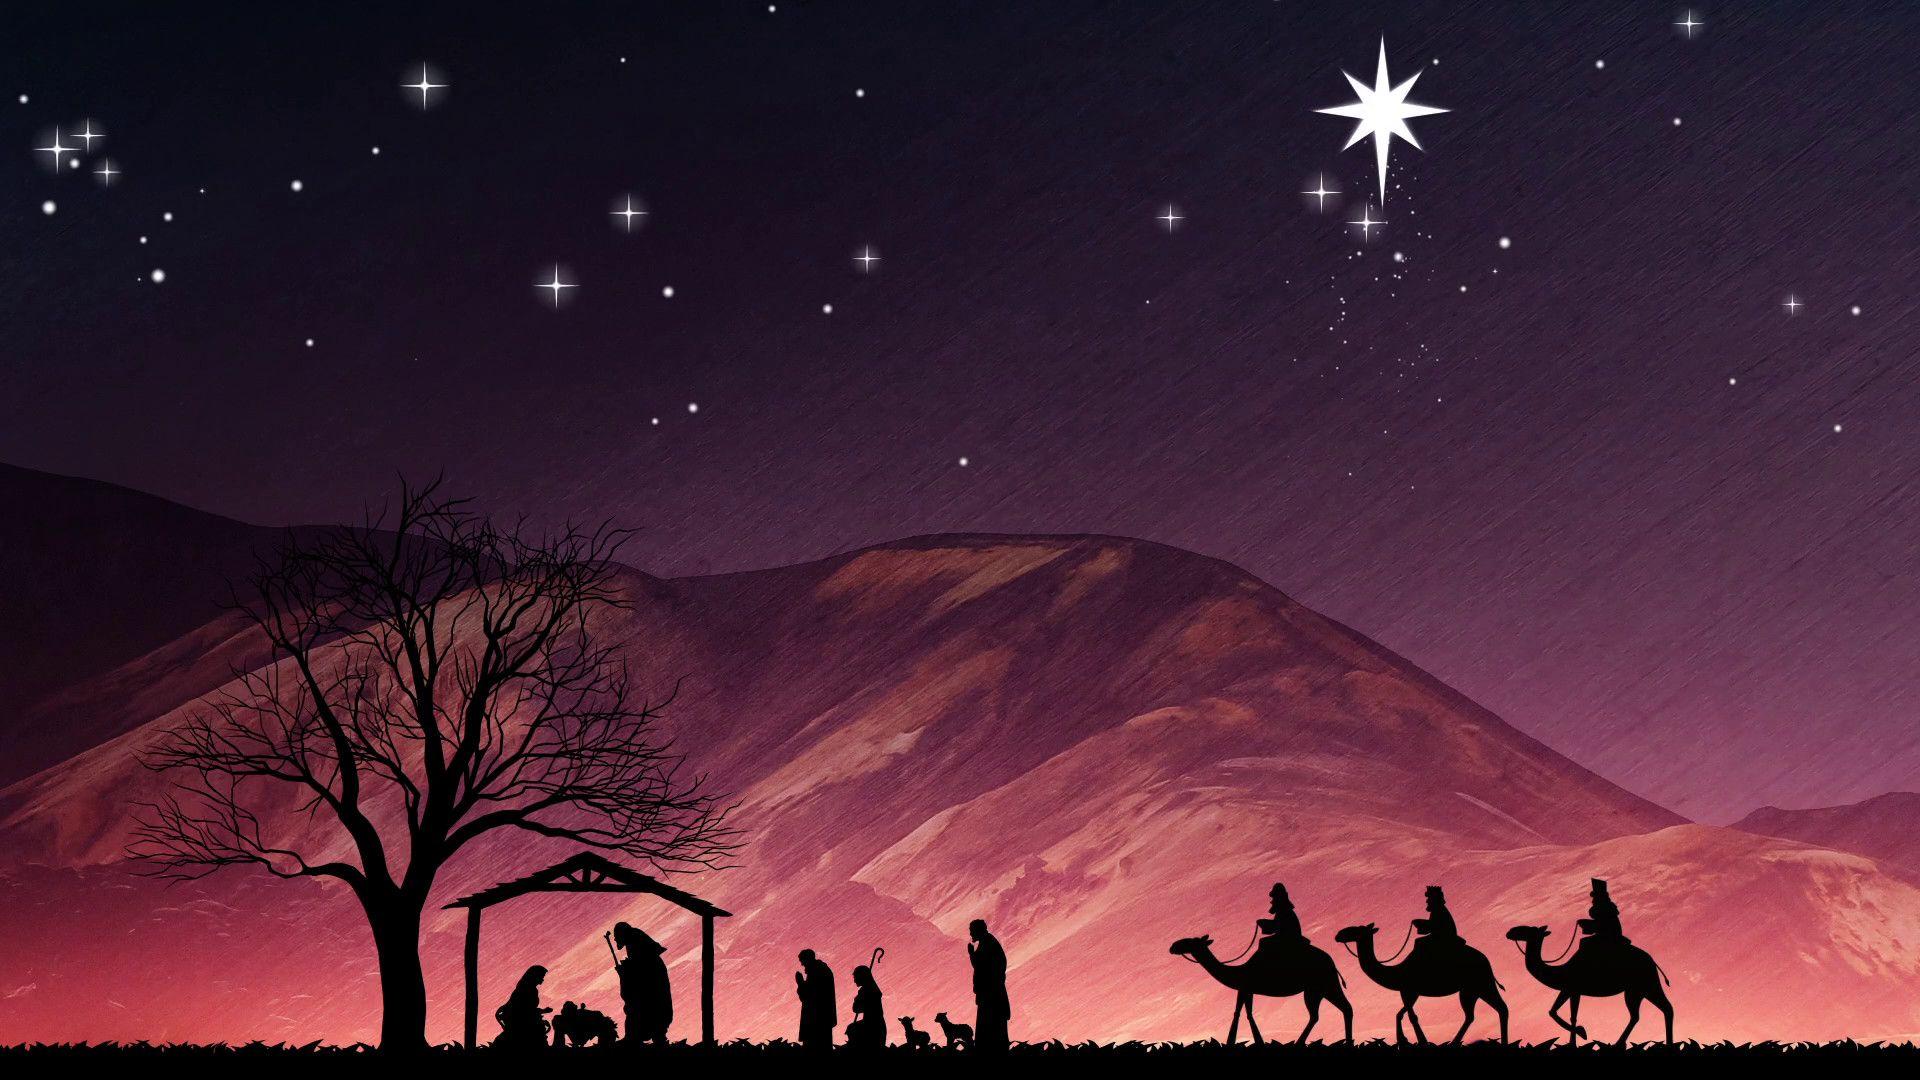 empty manger hd wallpaper - photo #11